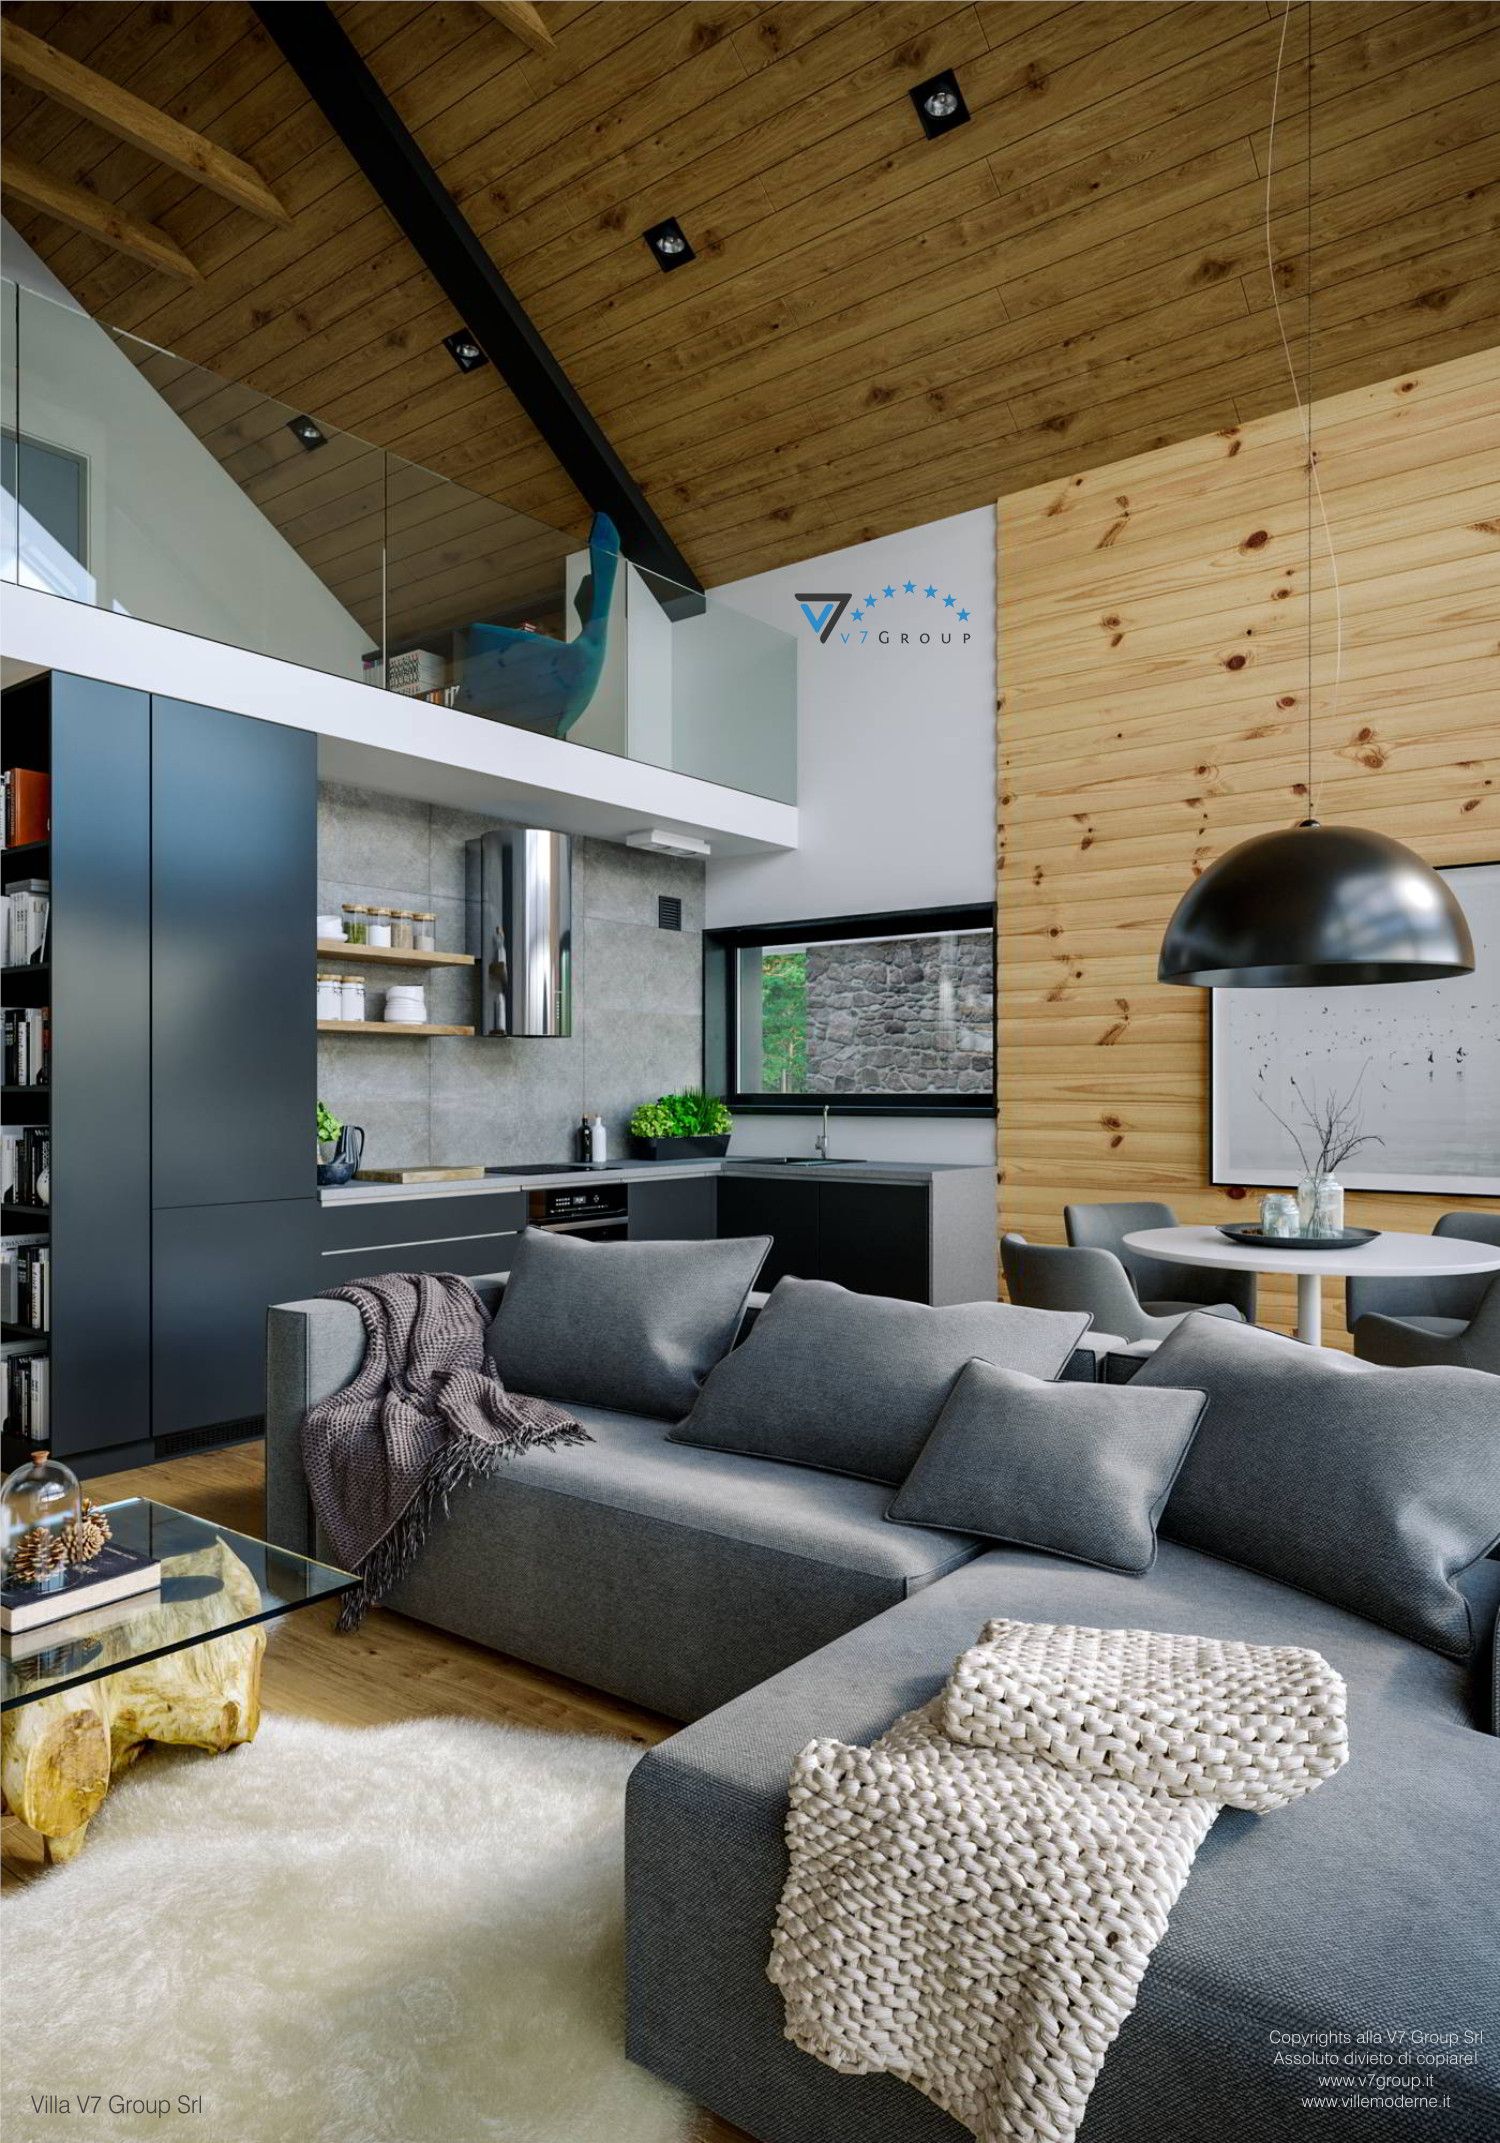 Immagine Villa V66 - interno 7 - vista cucina grande